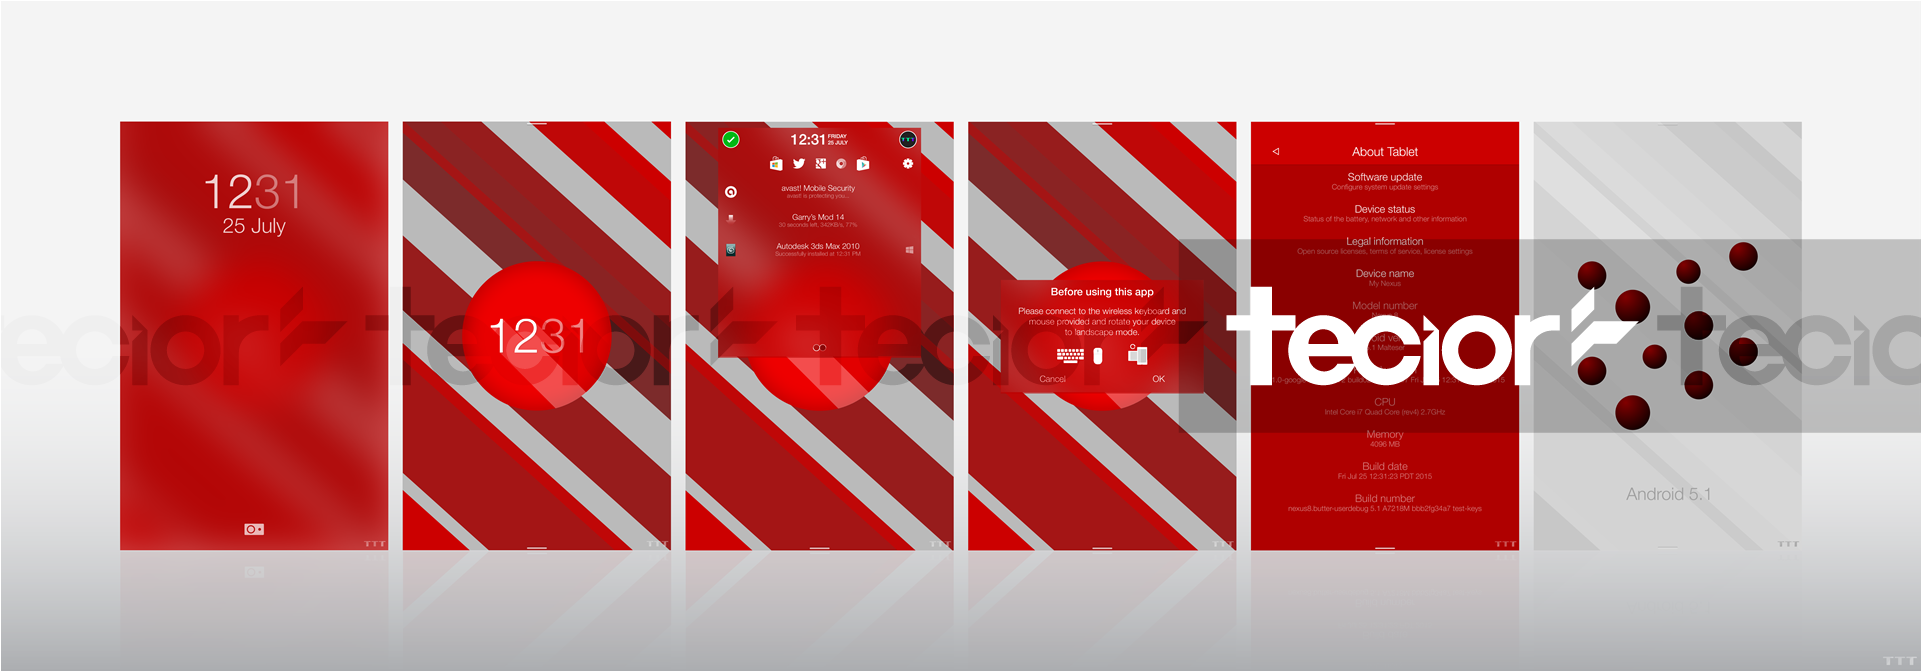 Android 5.1 Malteser Concept